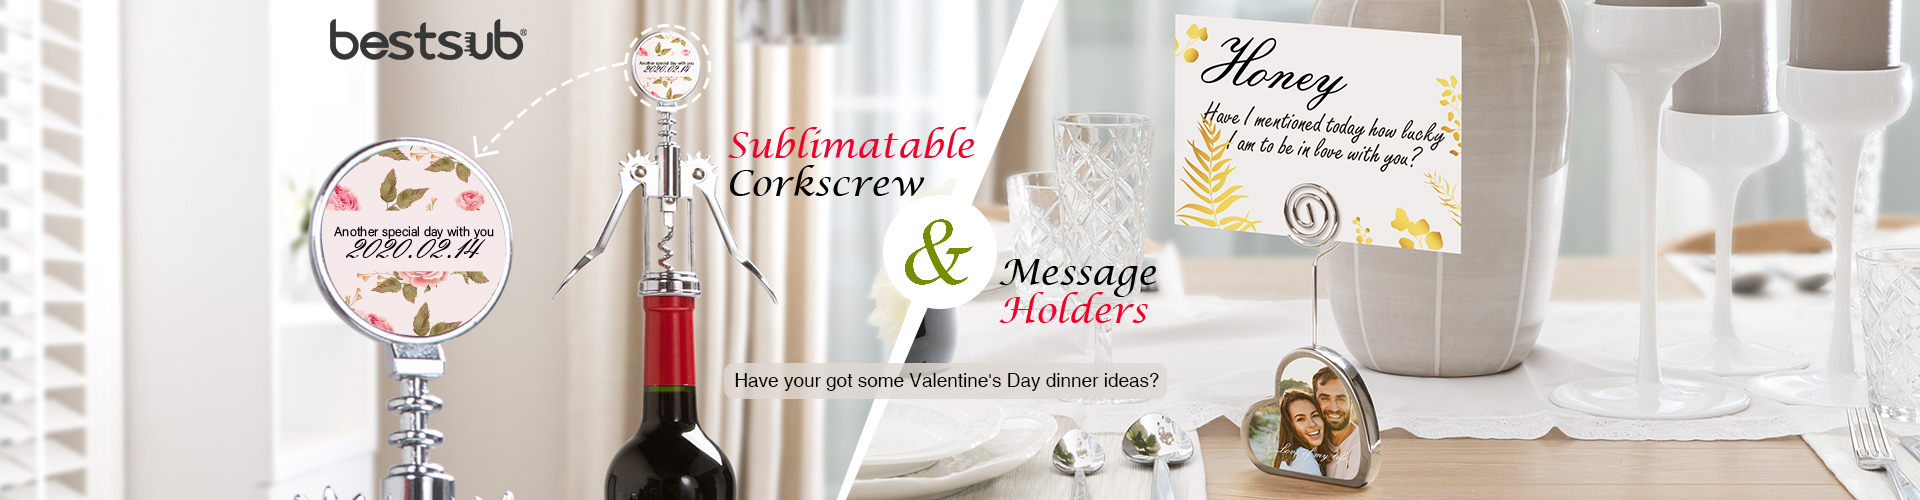 2020-1-8_Sublimatable_Corkscrew_Message_Holders_new_web